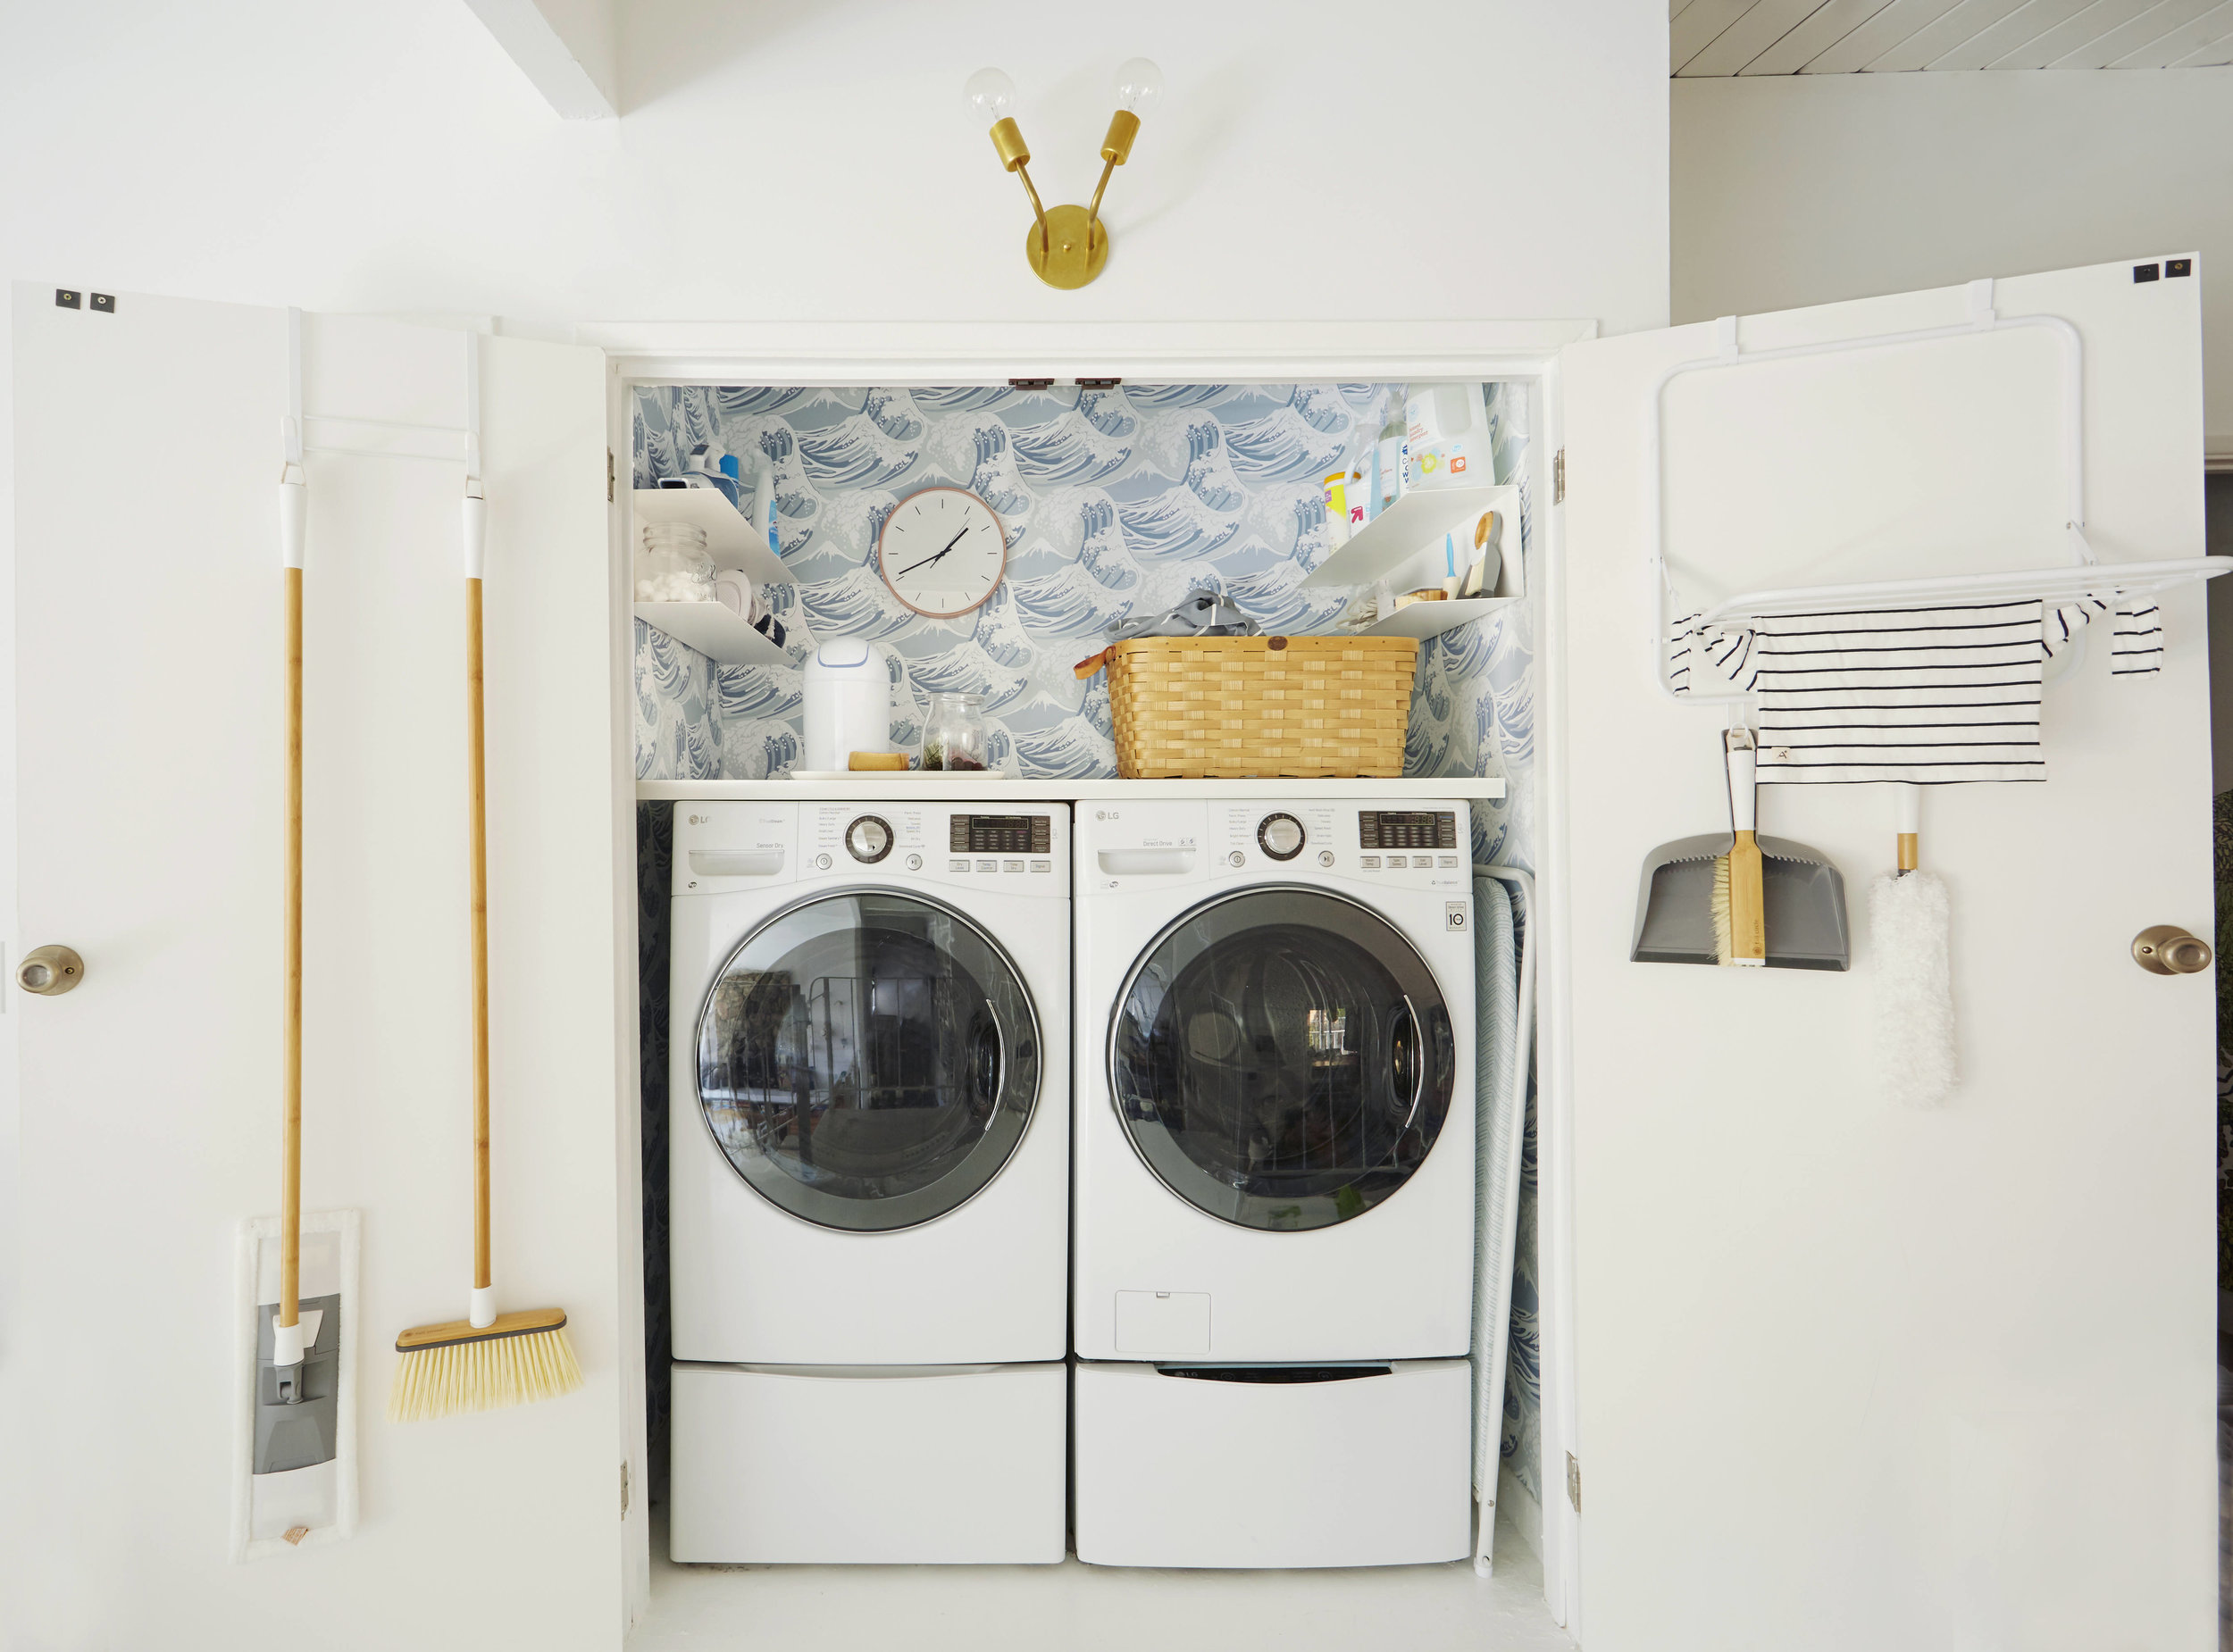 Emily-Henderson-Laundry-Closet-Doors-Open.jpg